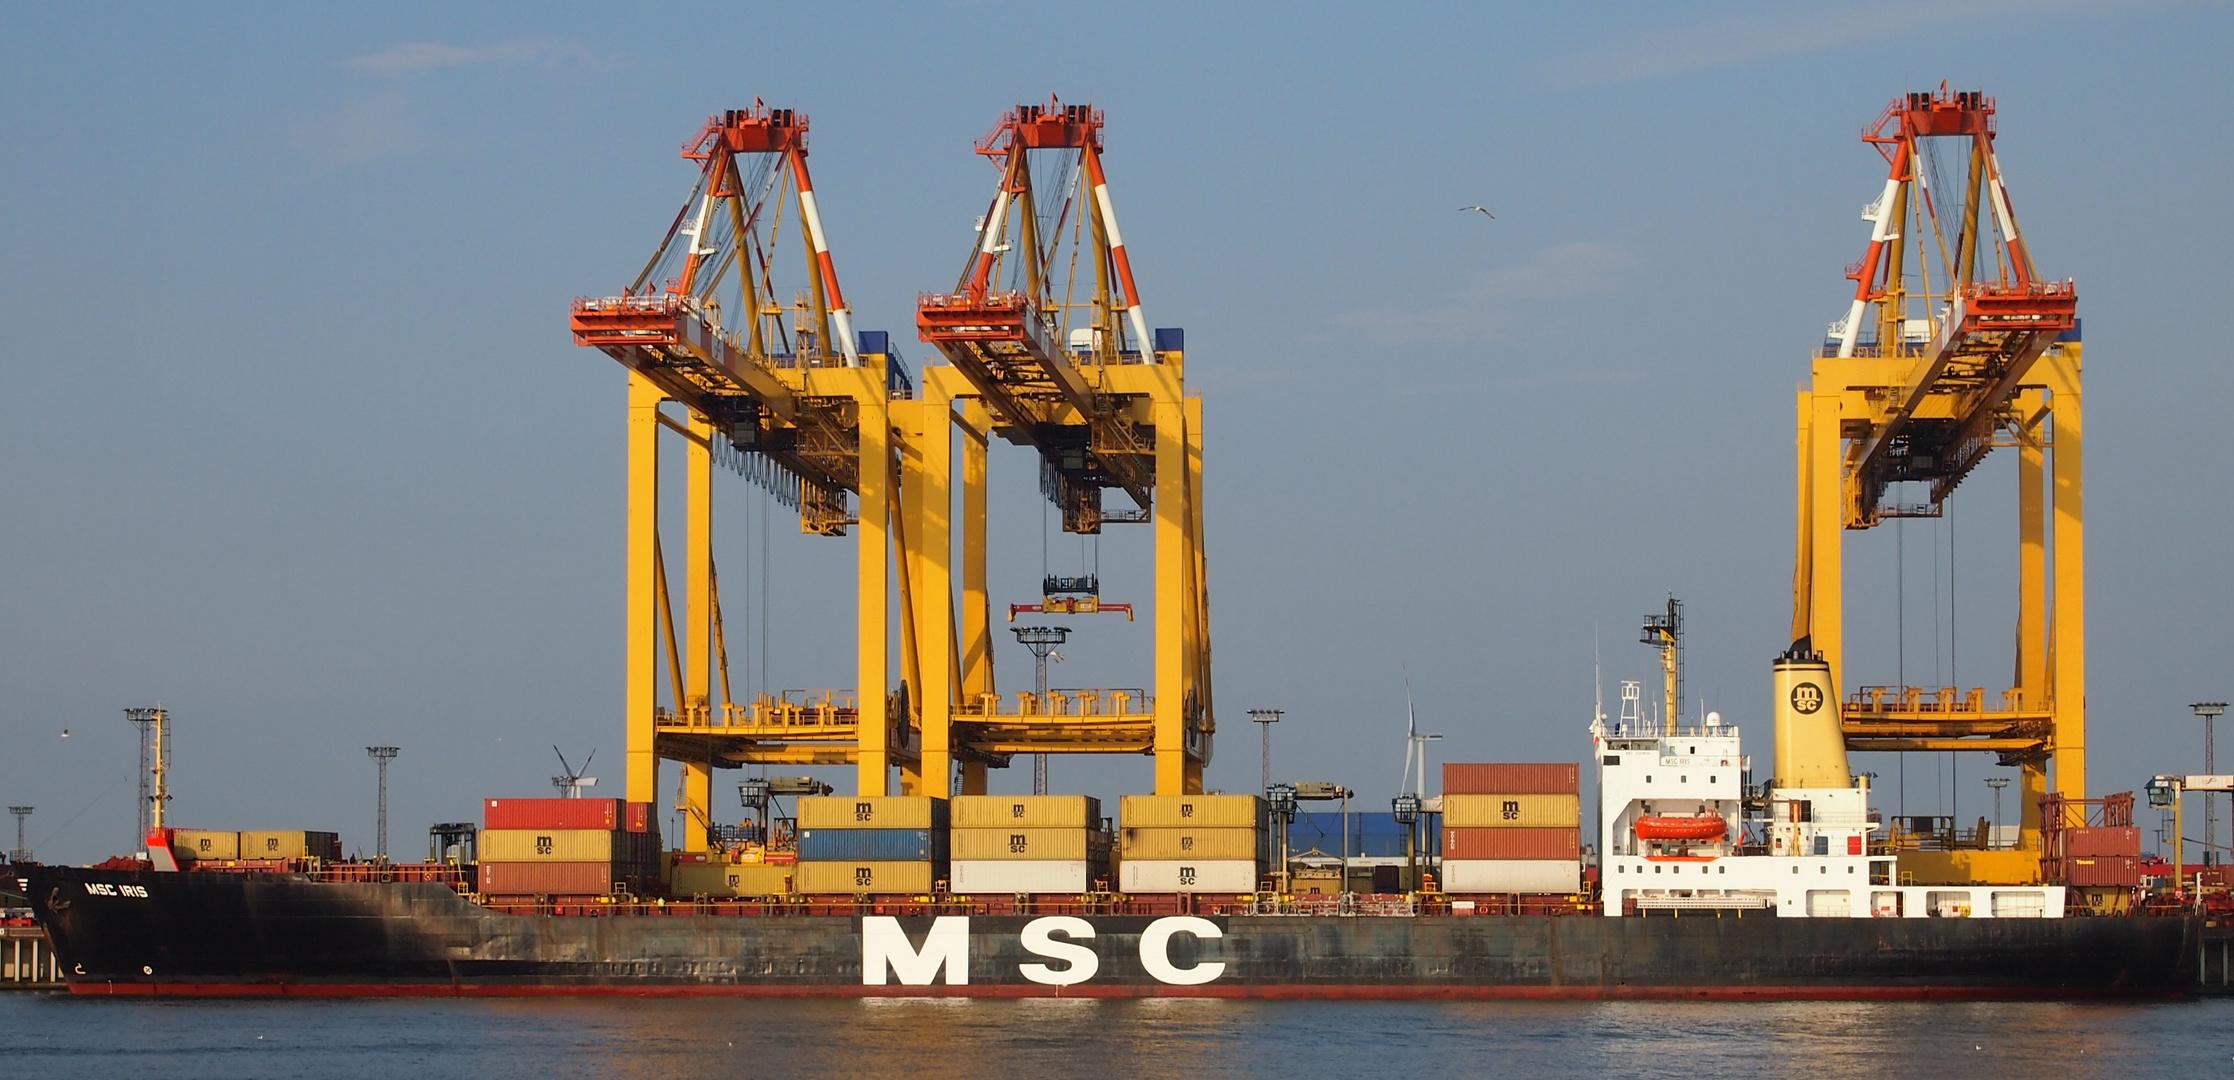 Containerschiff MSC Iris